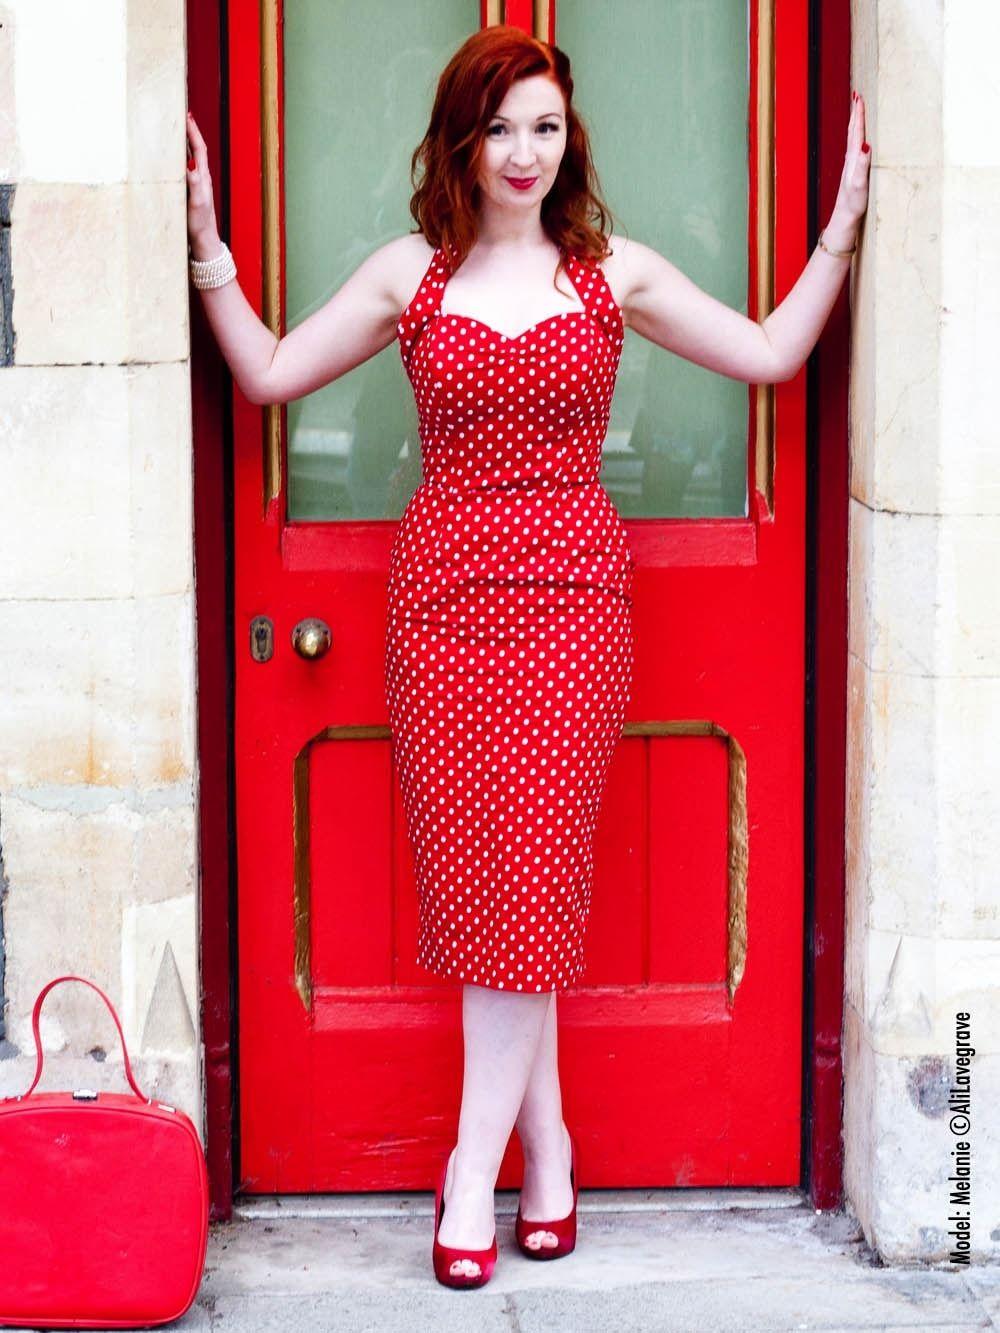 c830b7b9ea872 1950s Halterneck Pencil Red White Spot Dress from Vivien of Holloway ...